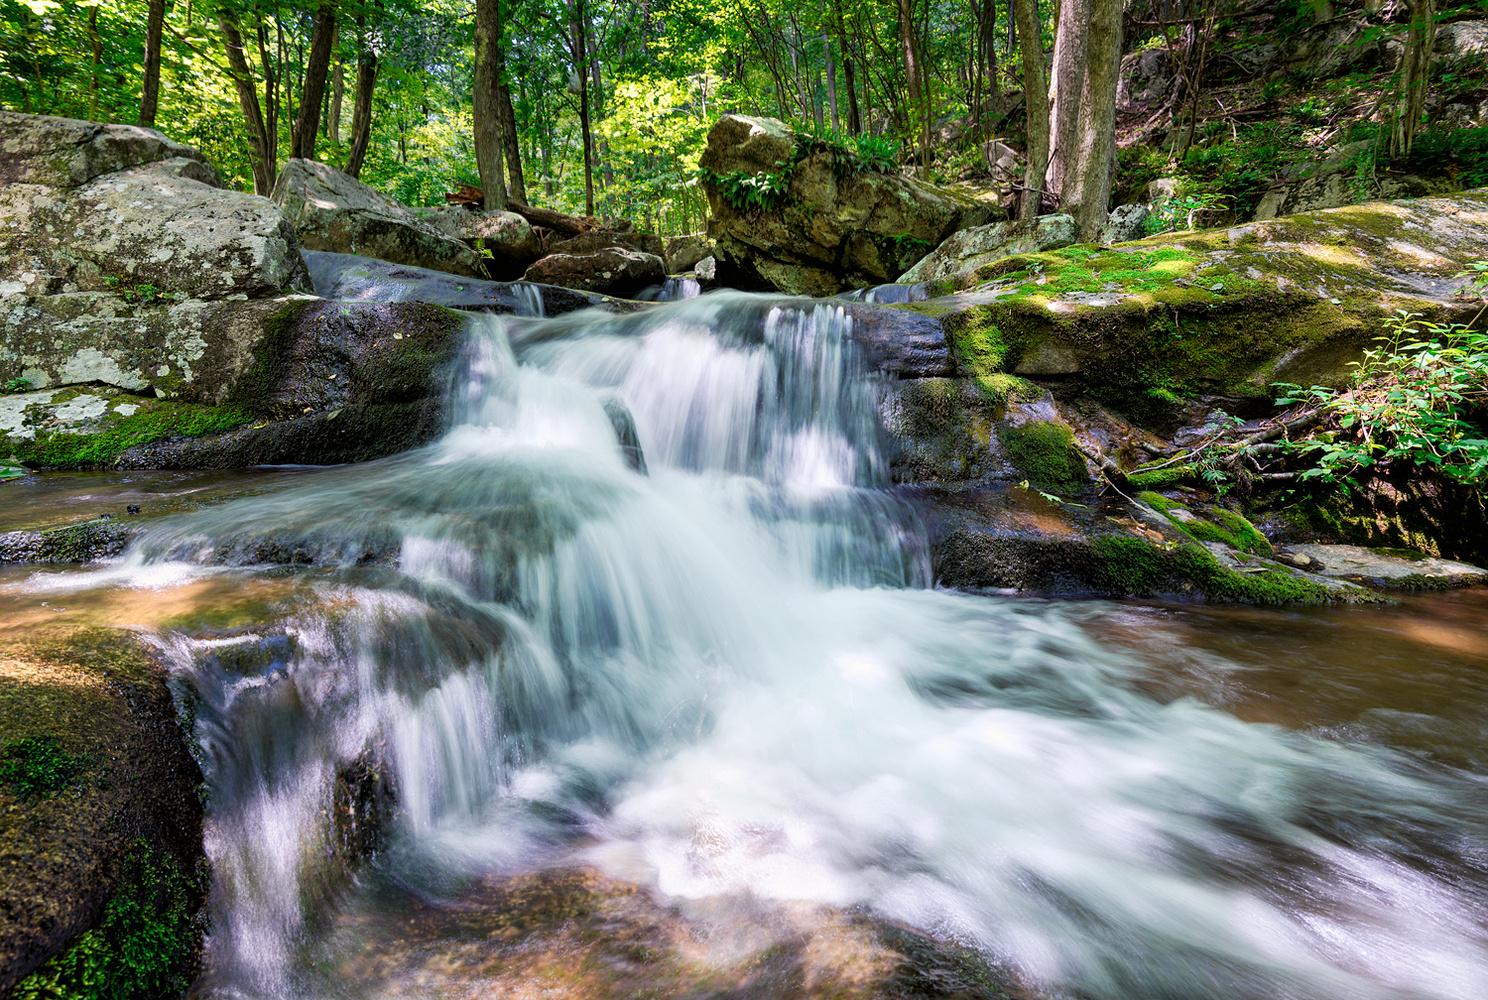 Hogchamp Branch Waterfall, Shenandoah National Park by Daniel McCloud